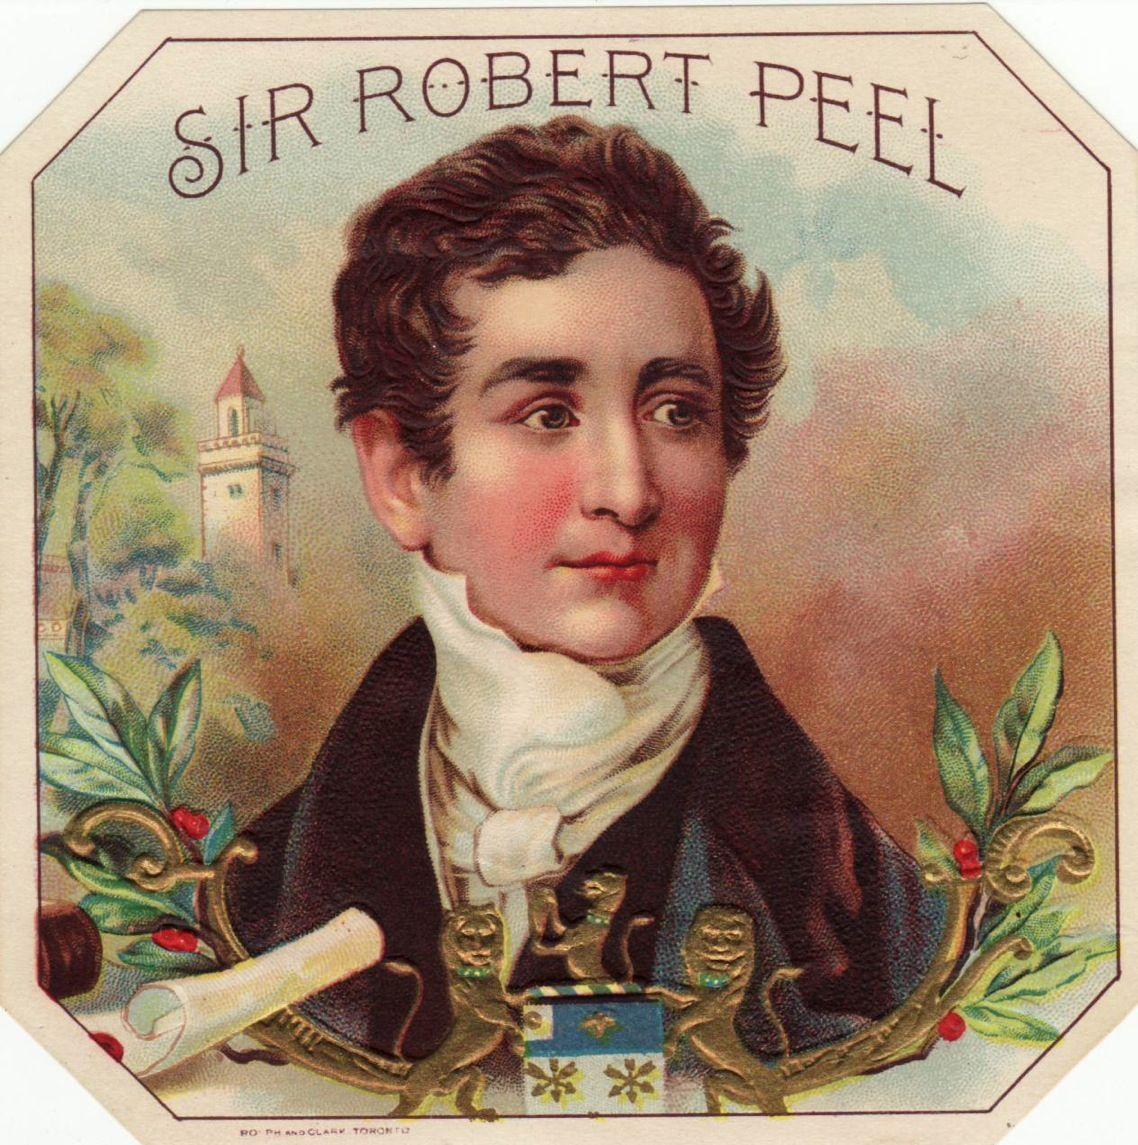 sir robert peel, prime minister of the united kingdom, 1841-1846